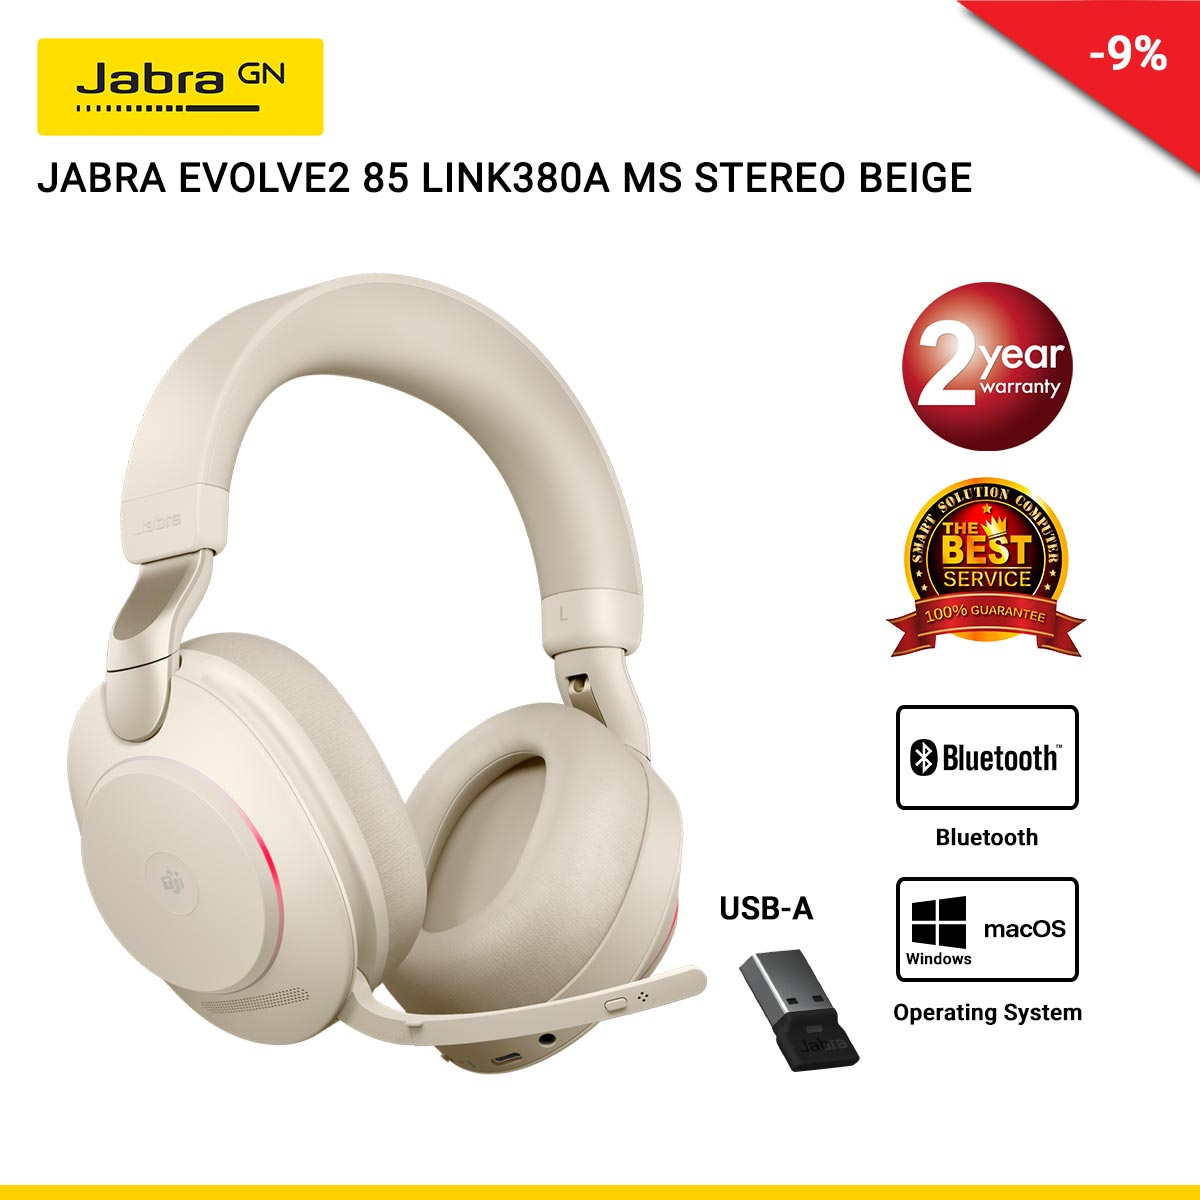 JABRA EVOLVE2 85 LINK380A MS STEREO BEIGE (JBA-28599-999-998)